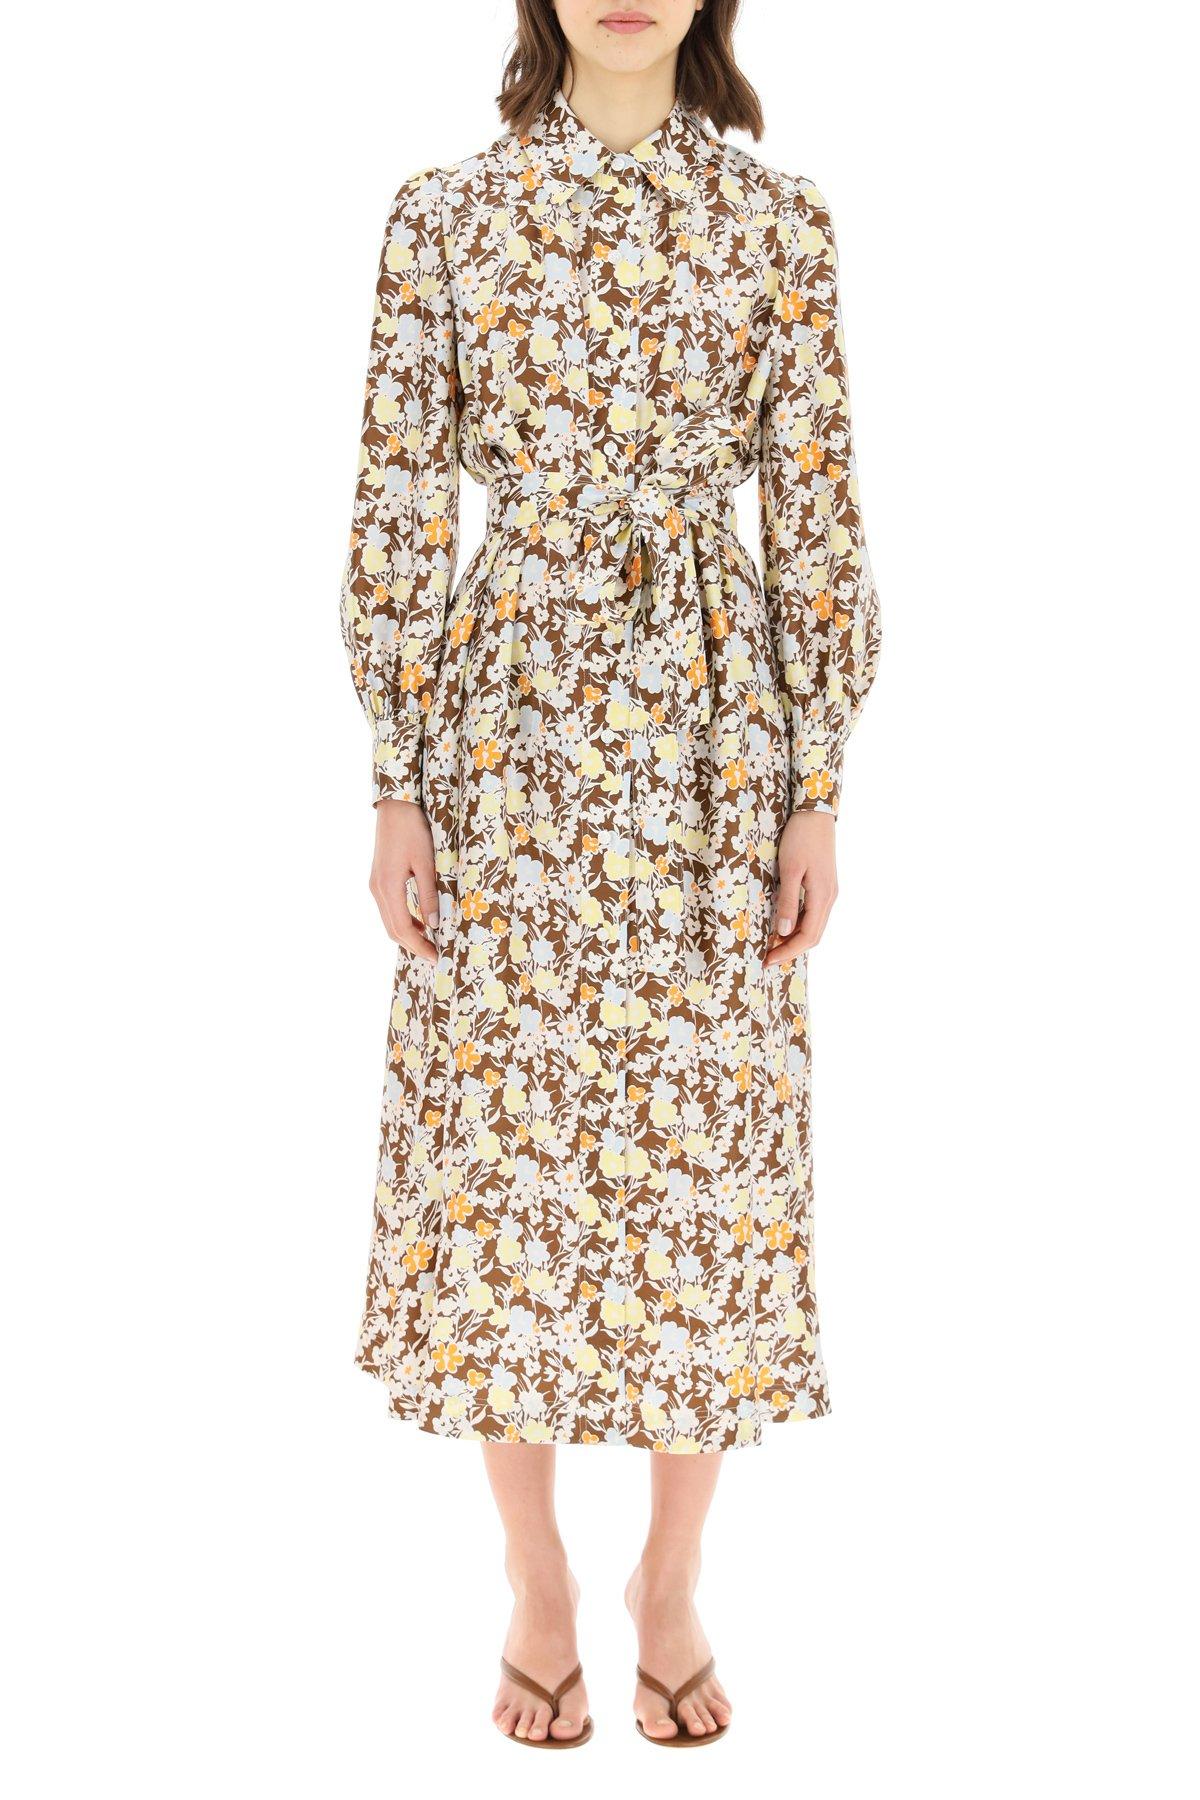 Tory burch abito lungo chemisier in seta floreale